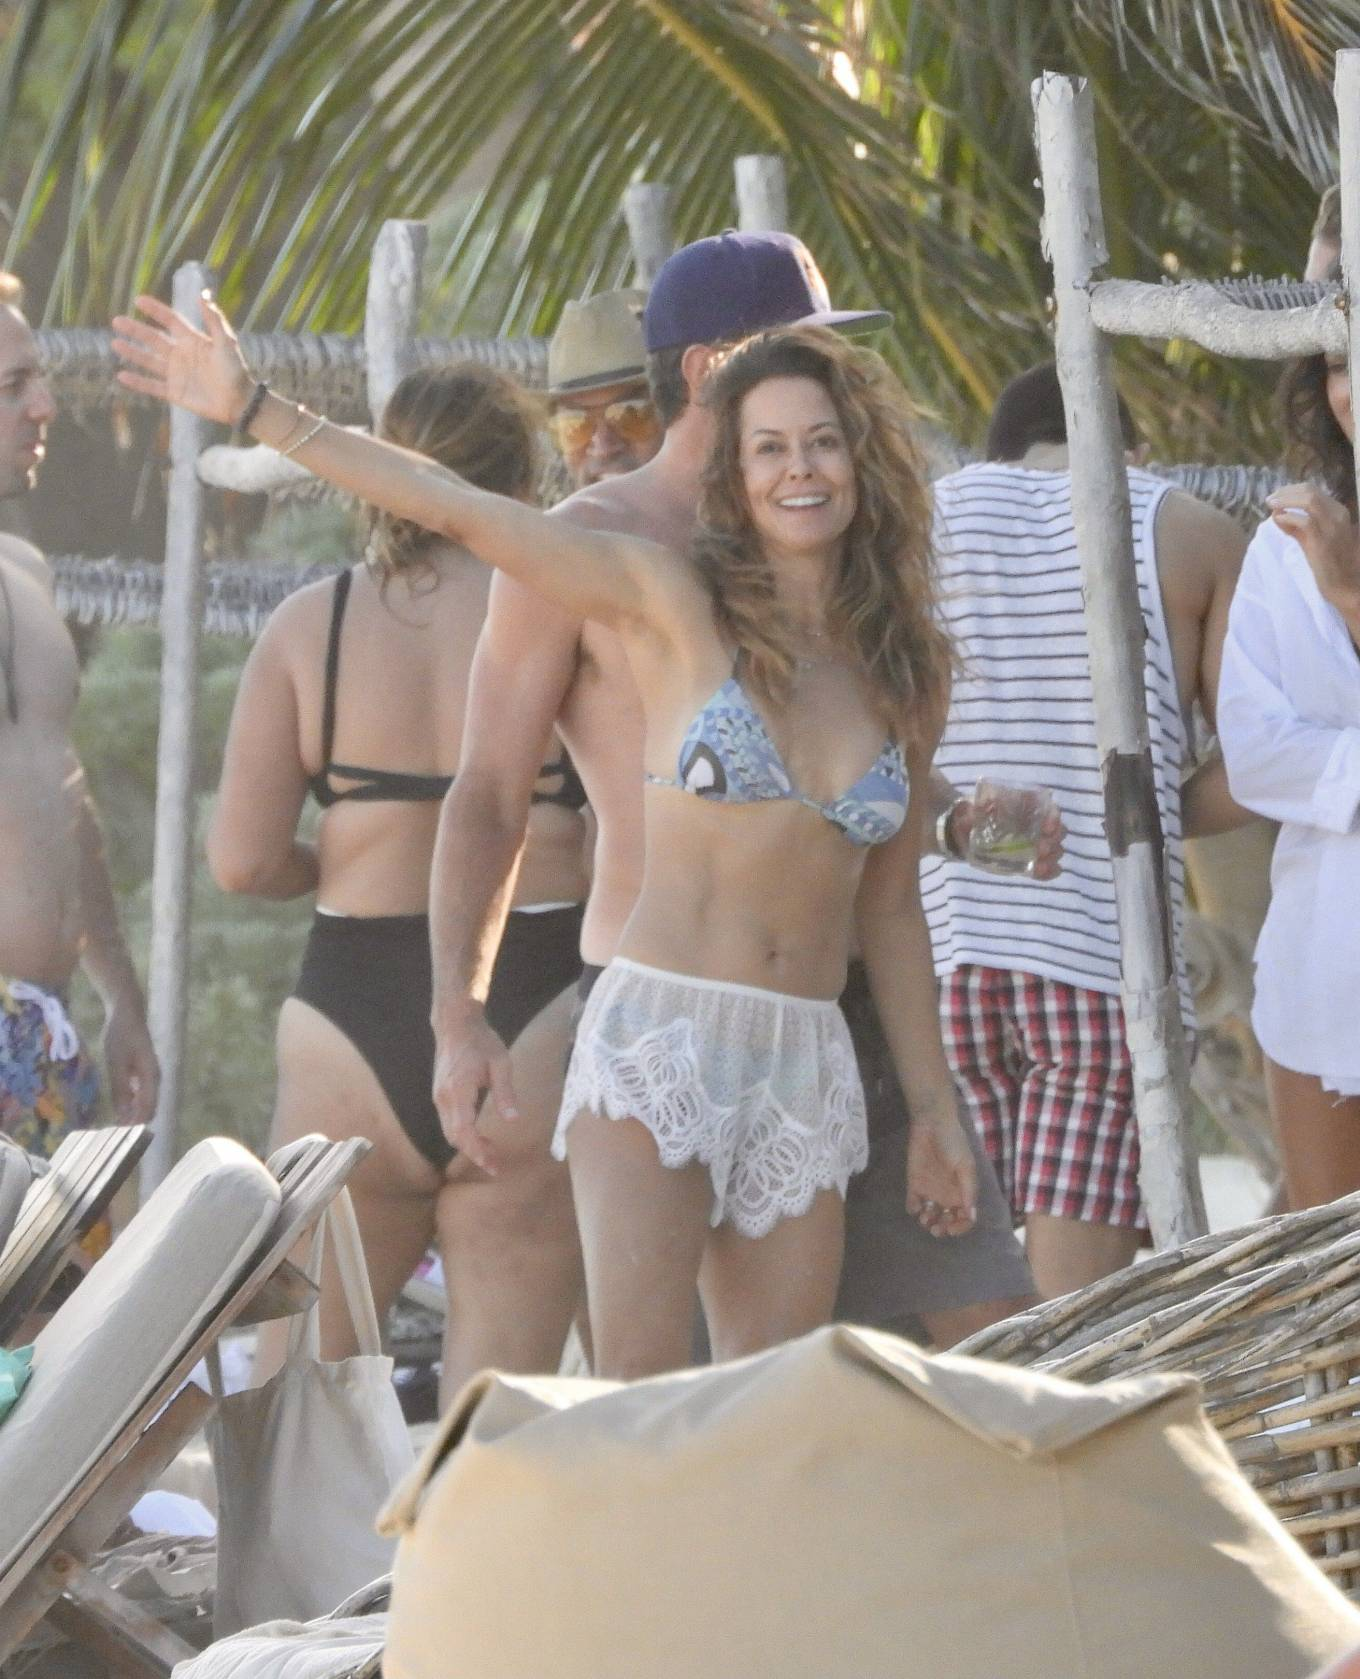 Brooke Burke - Spotted in a bikini on the beach in Tulum